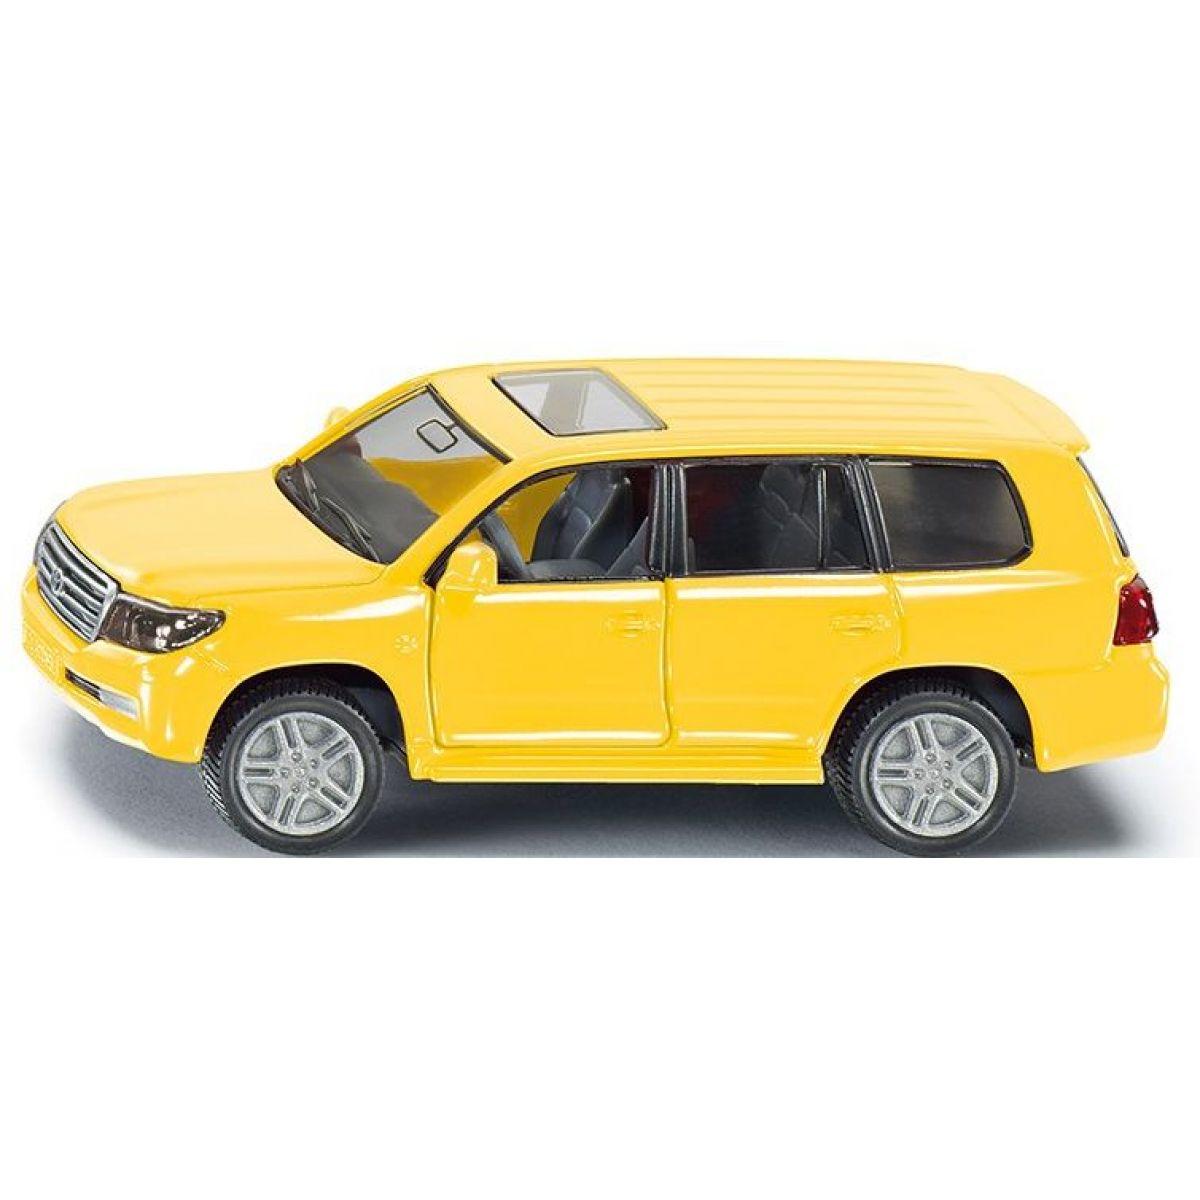 Siku Auto Toyota Landcruiser žlutá model kov 1440 1:55